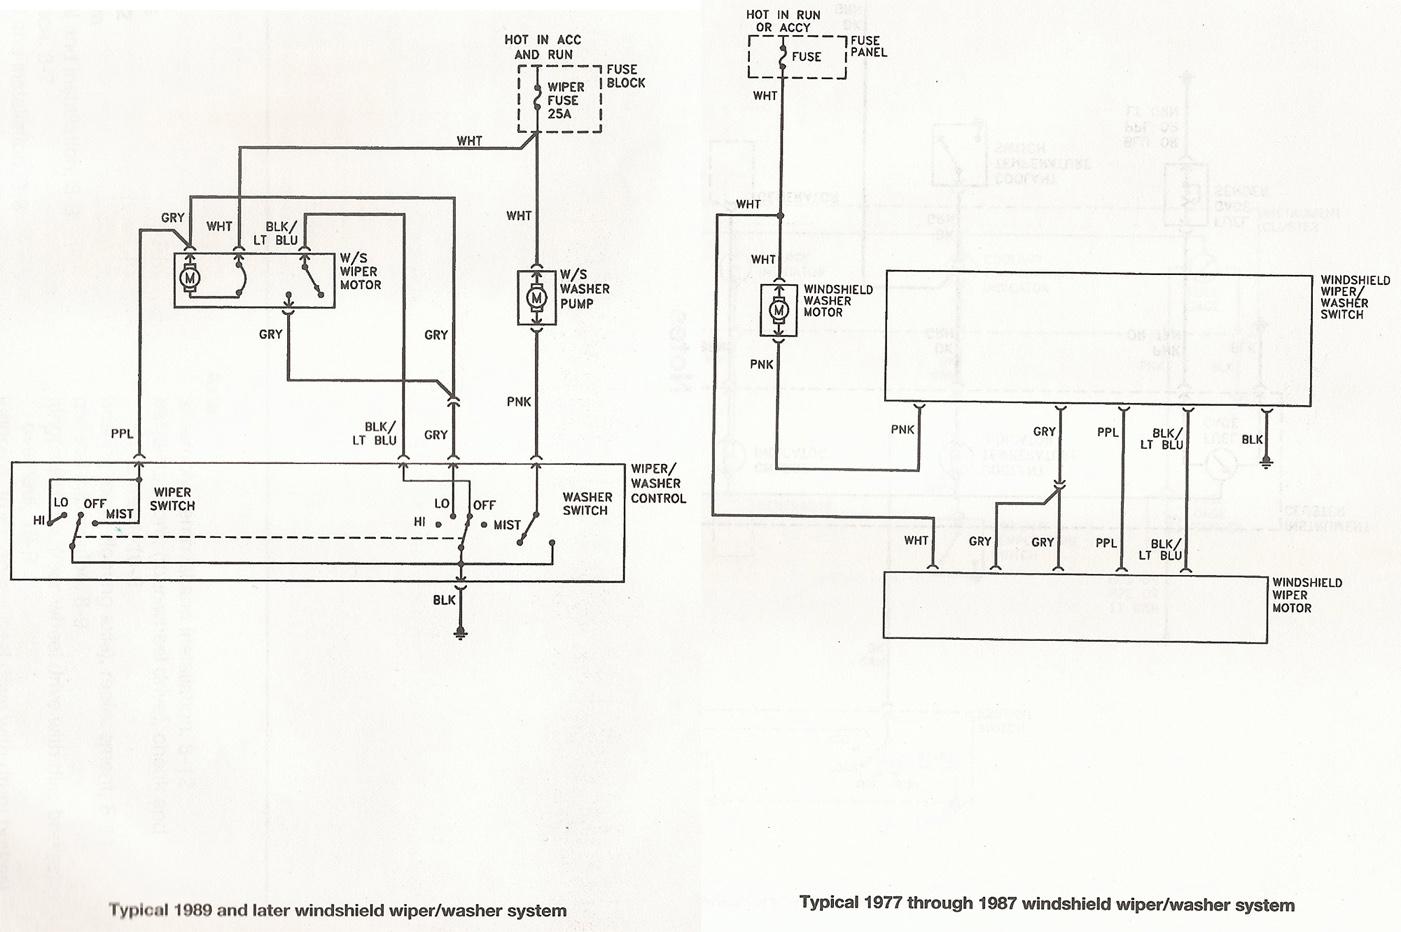 s10 wiper motor wiring diagram tail light 88 k5 blazer circuit and hub